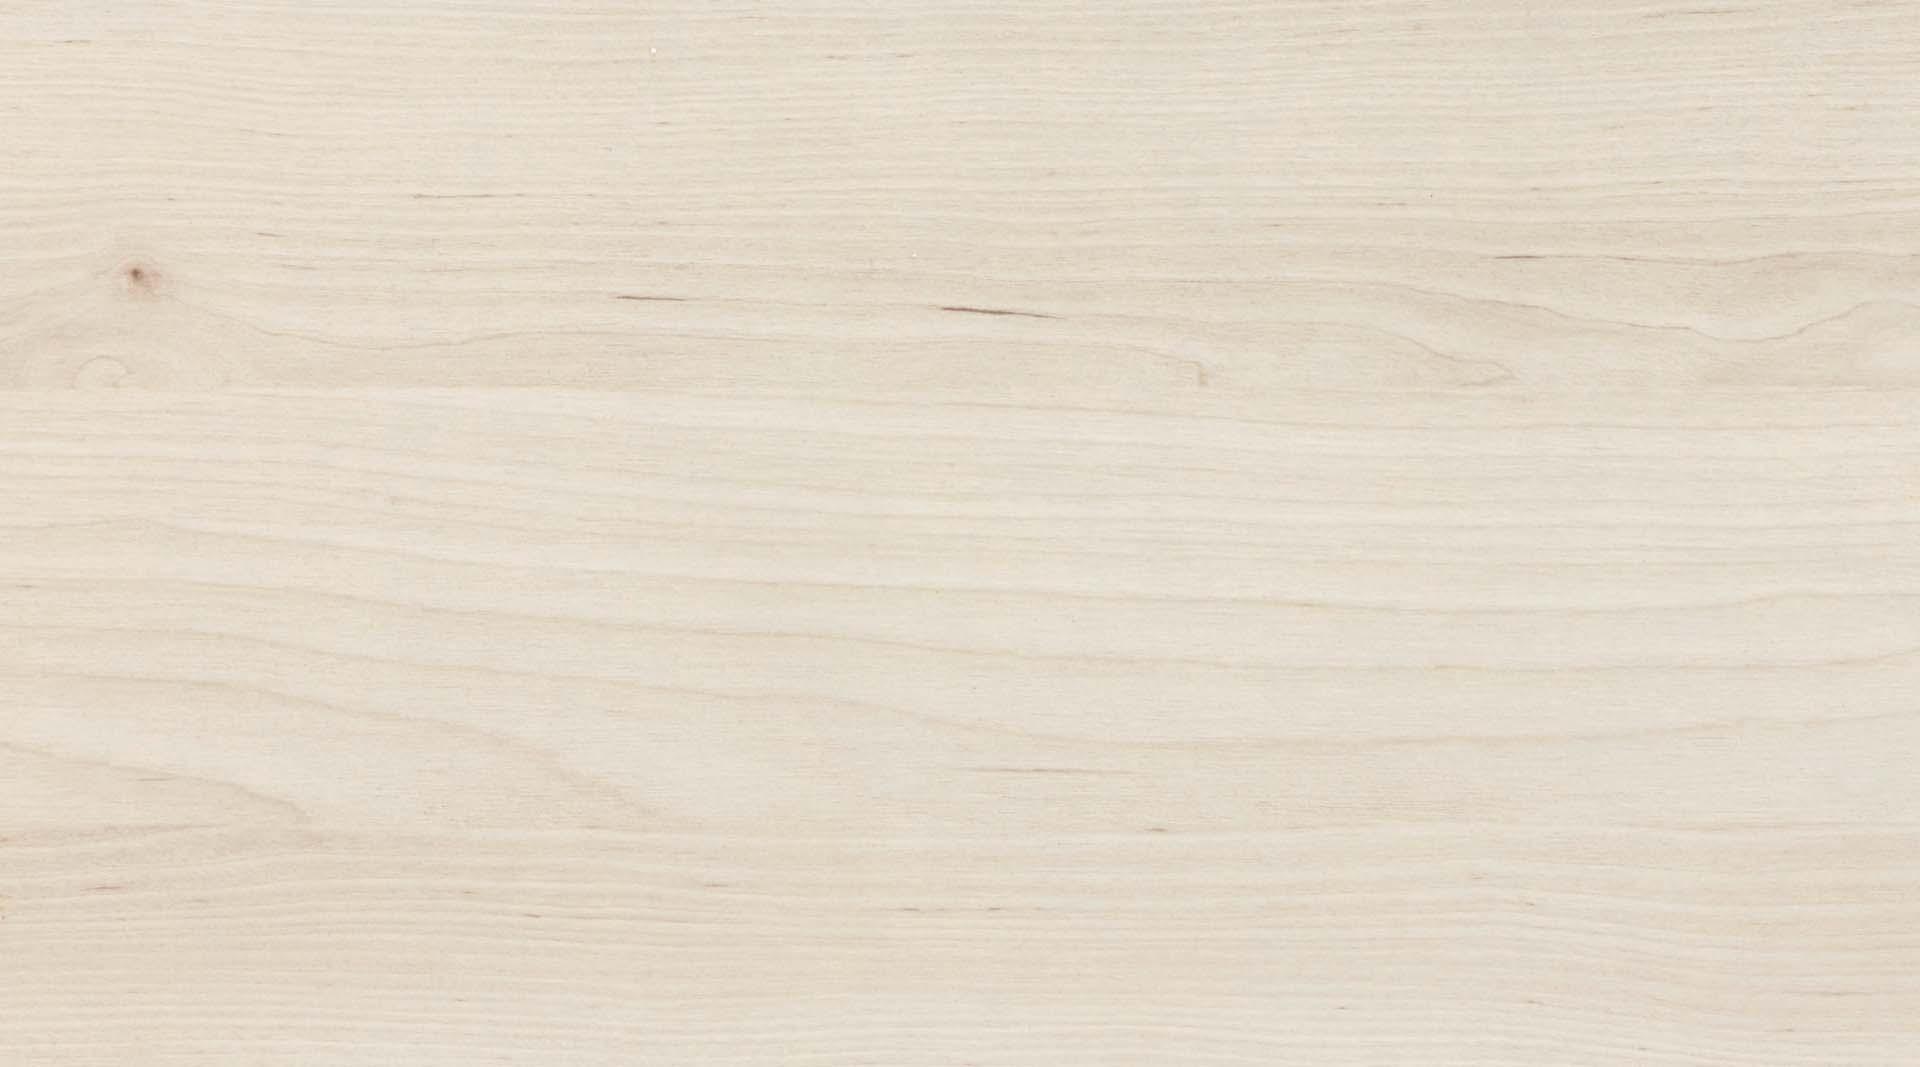 Kuche arbeitsplatte birke for Arbeitsplatte birke